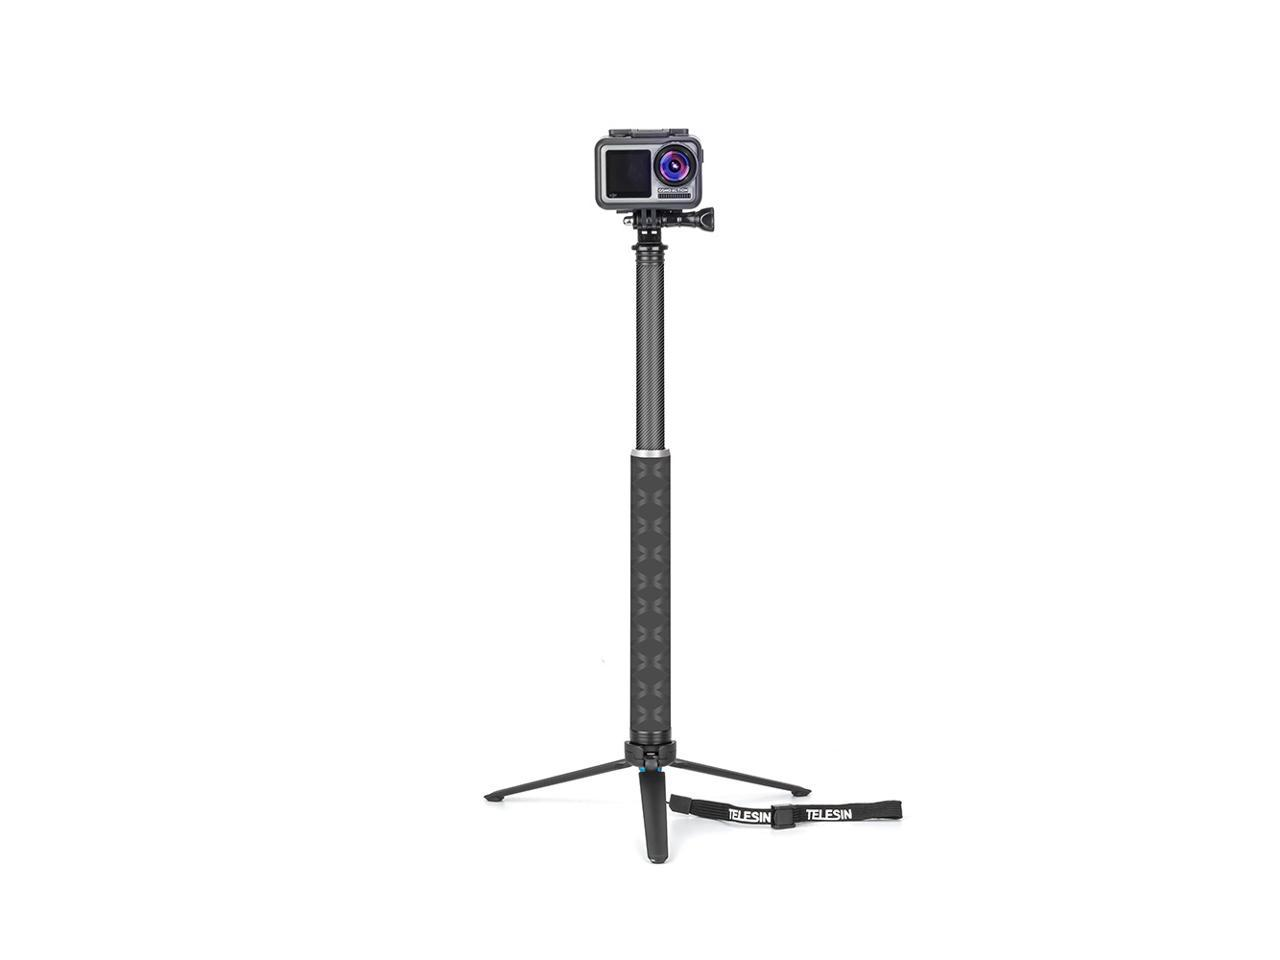 TELESIN GP-MNP-90T 90cm Carbon Fiber Foldable Extendable Selfie Stick with Tripod for Action Sports Camera Smartphone